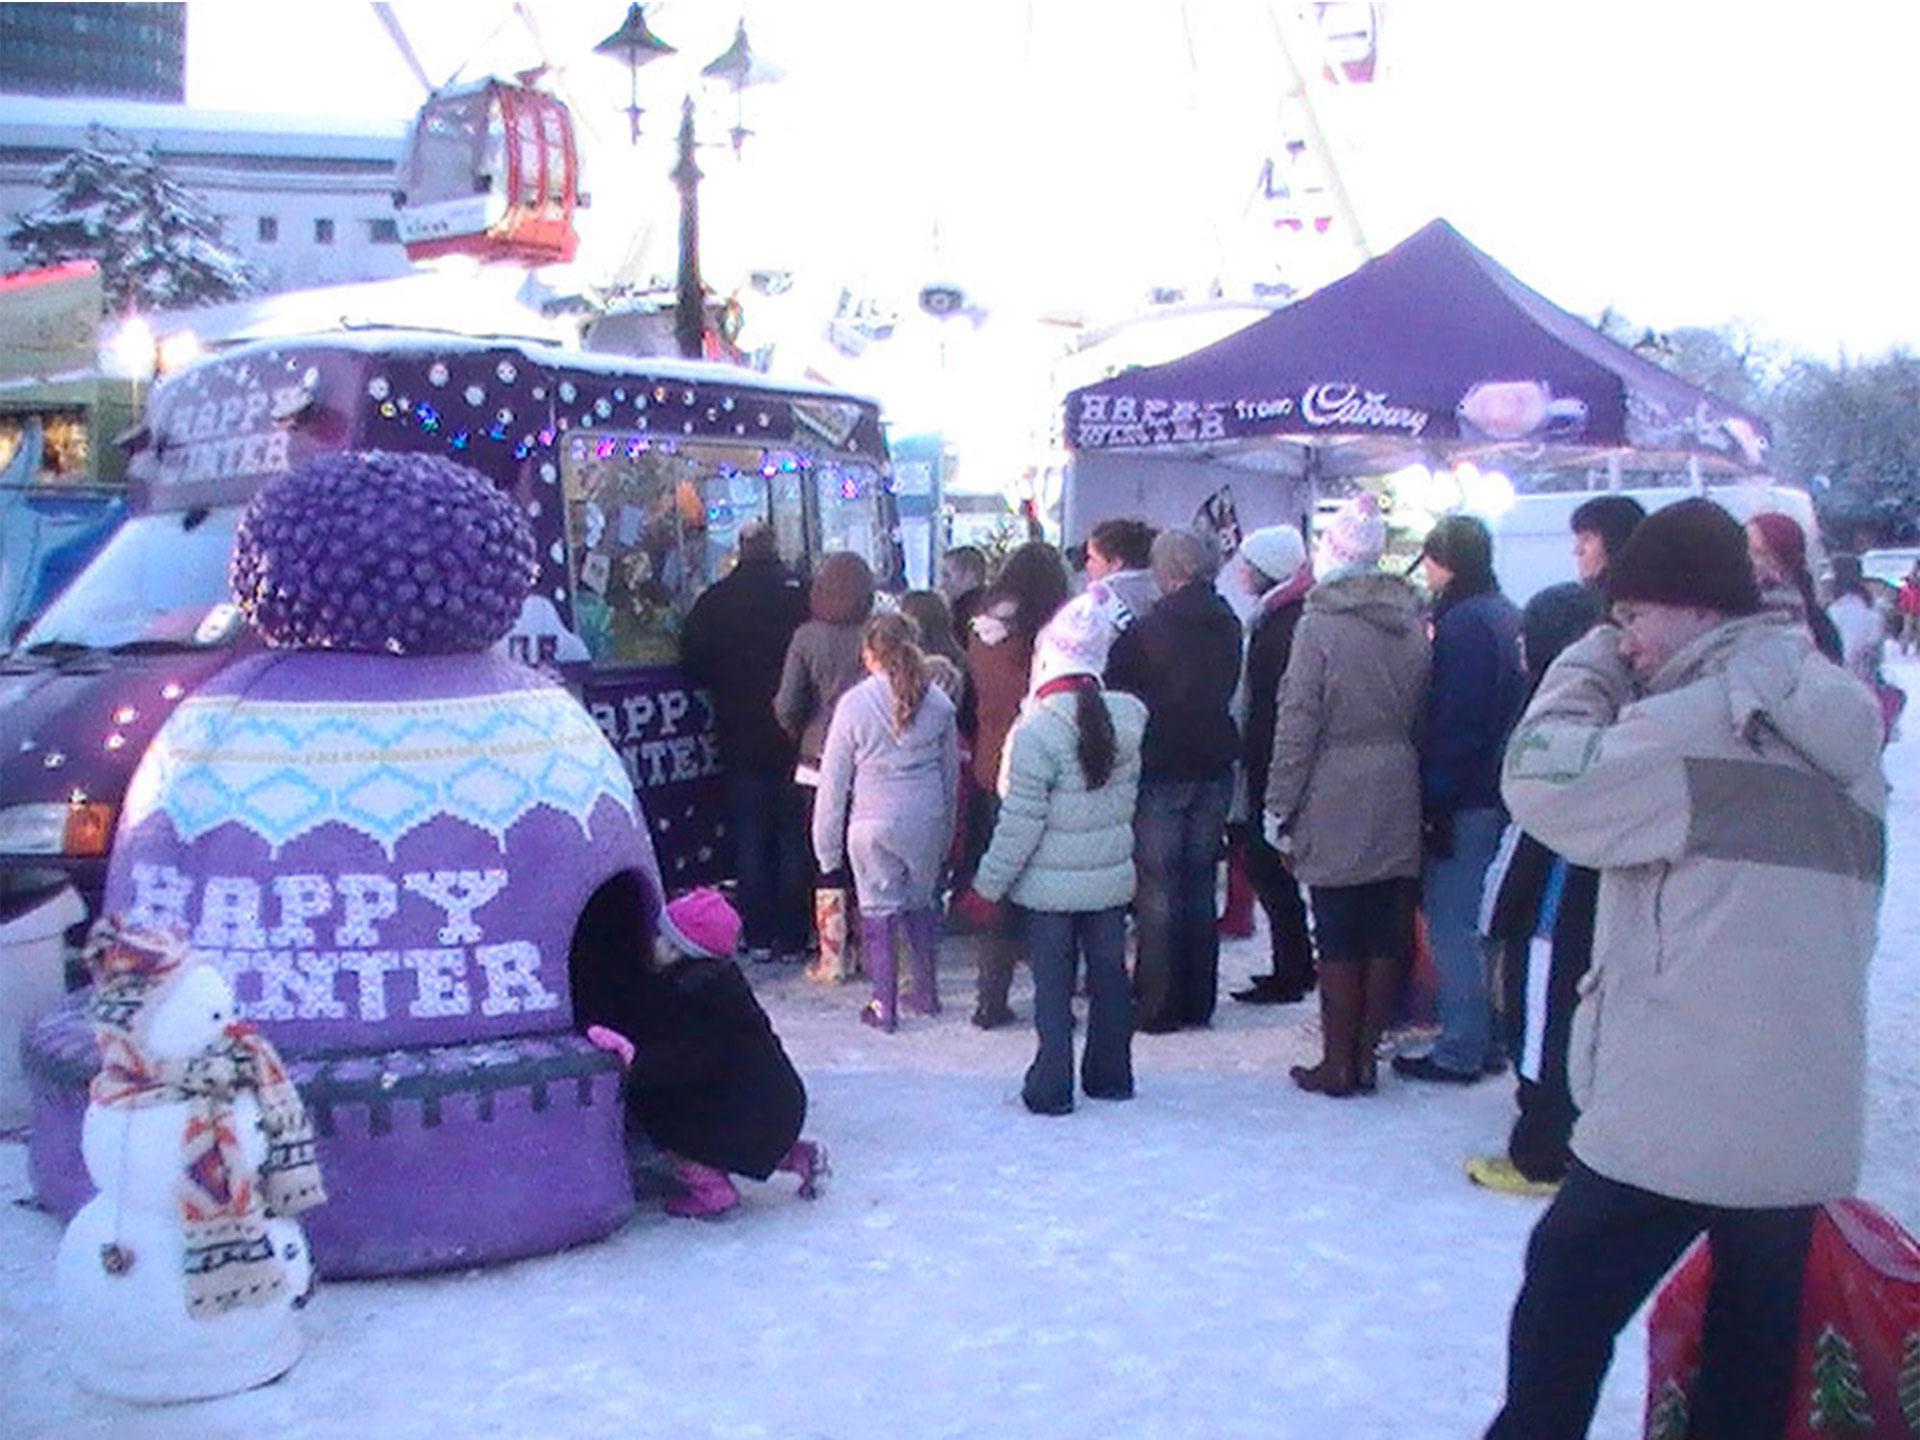 Experiential Marketing cadbury-case-study---sampling-ice-cream-van-creation-and-roadshow-tour